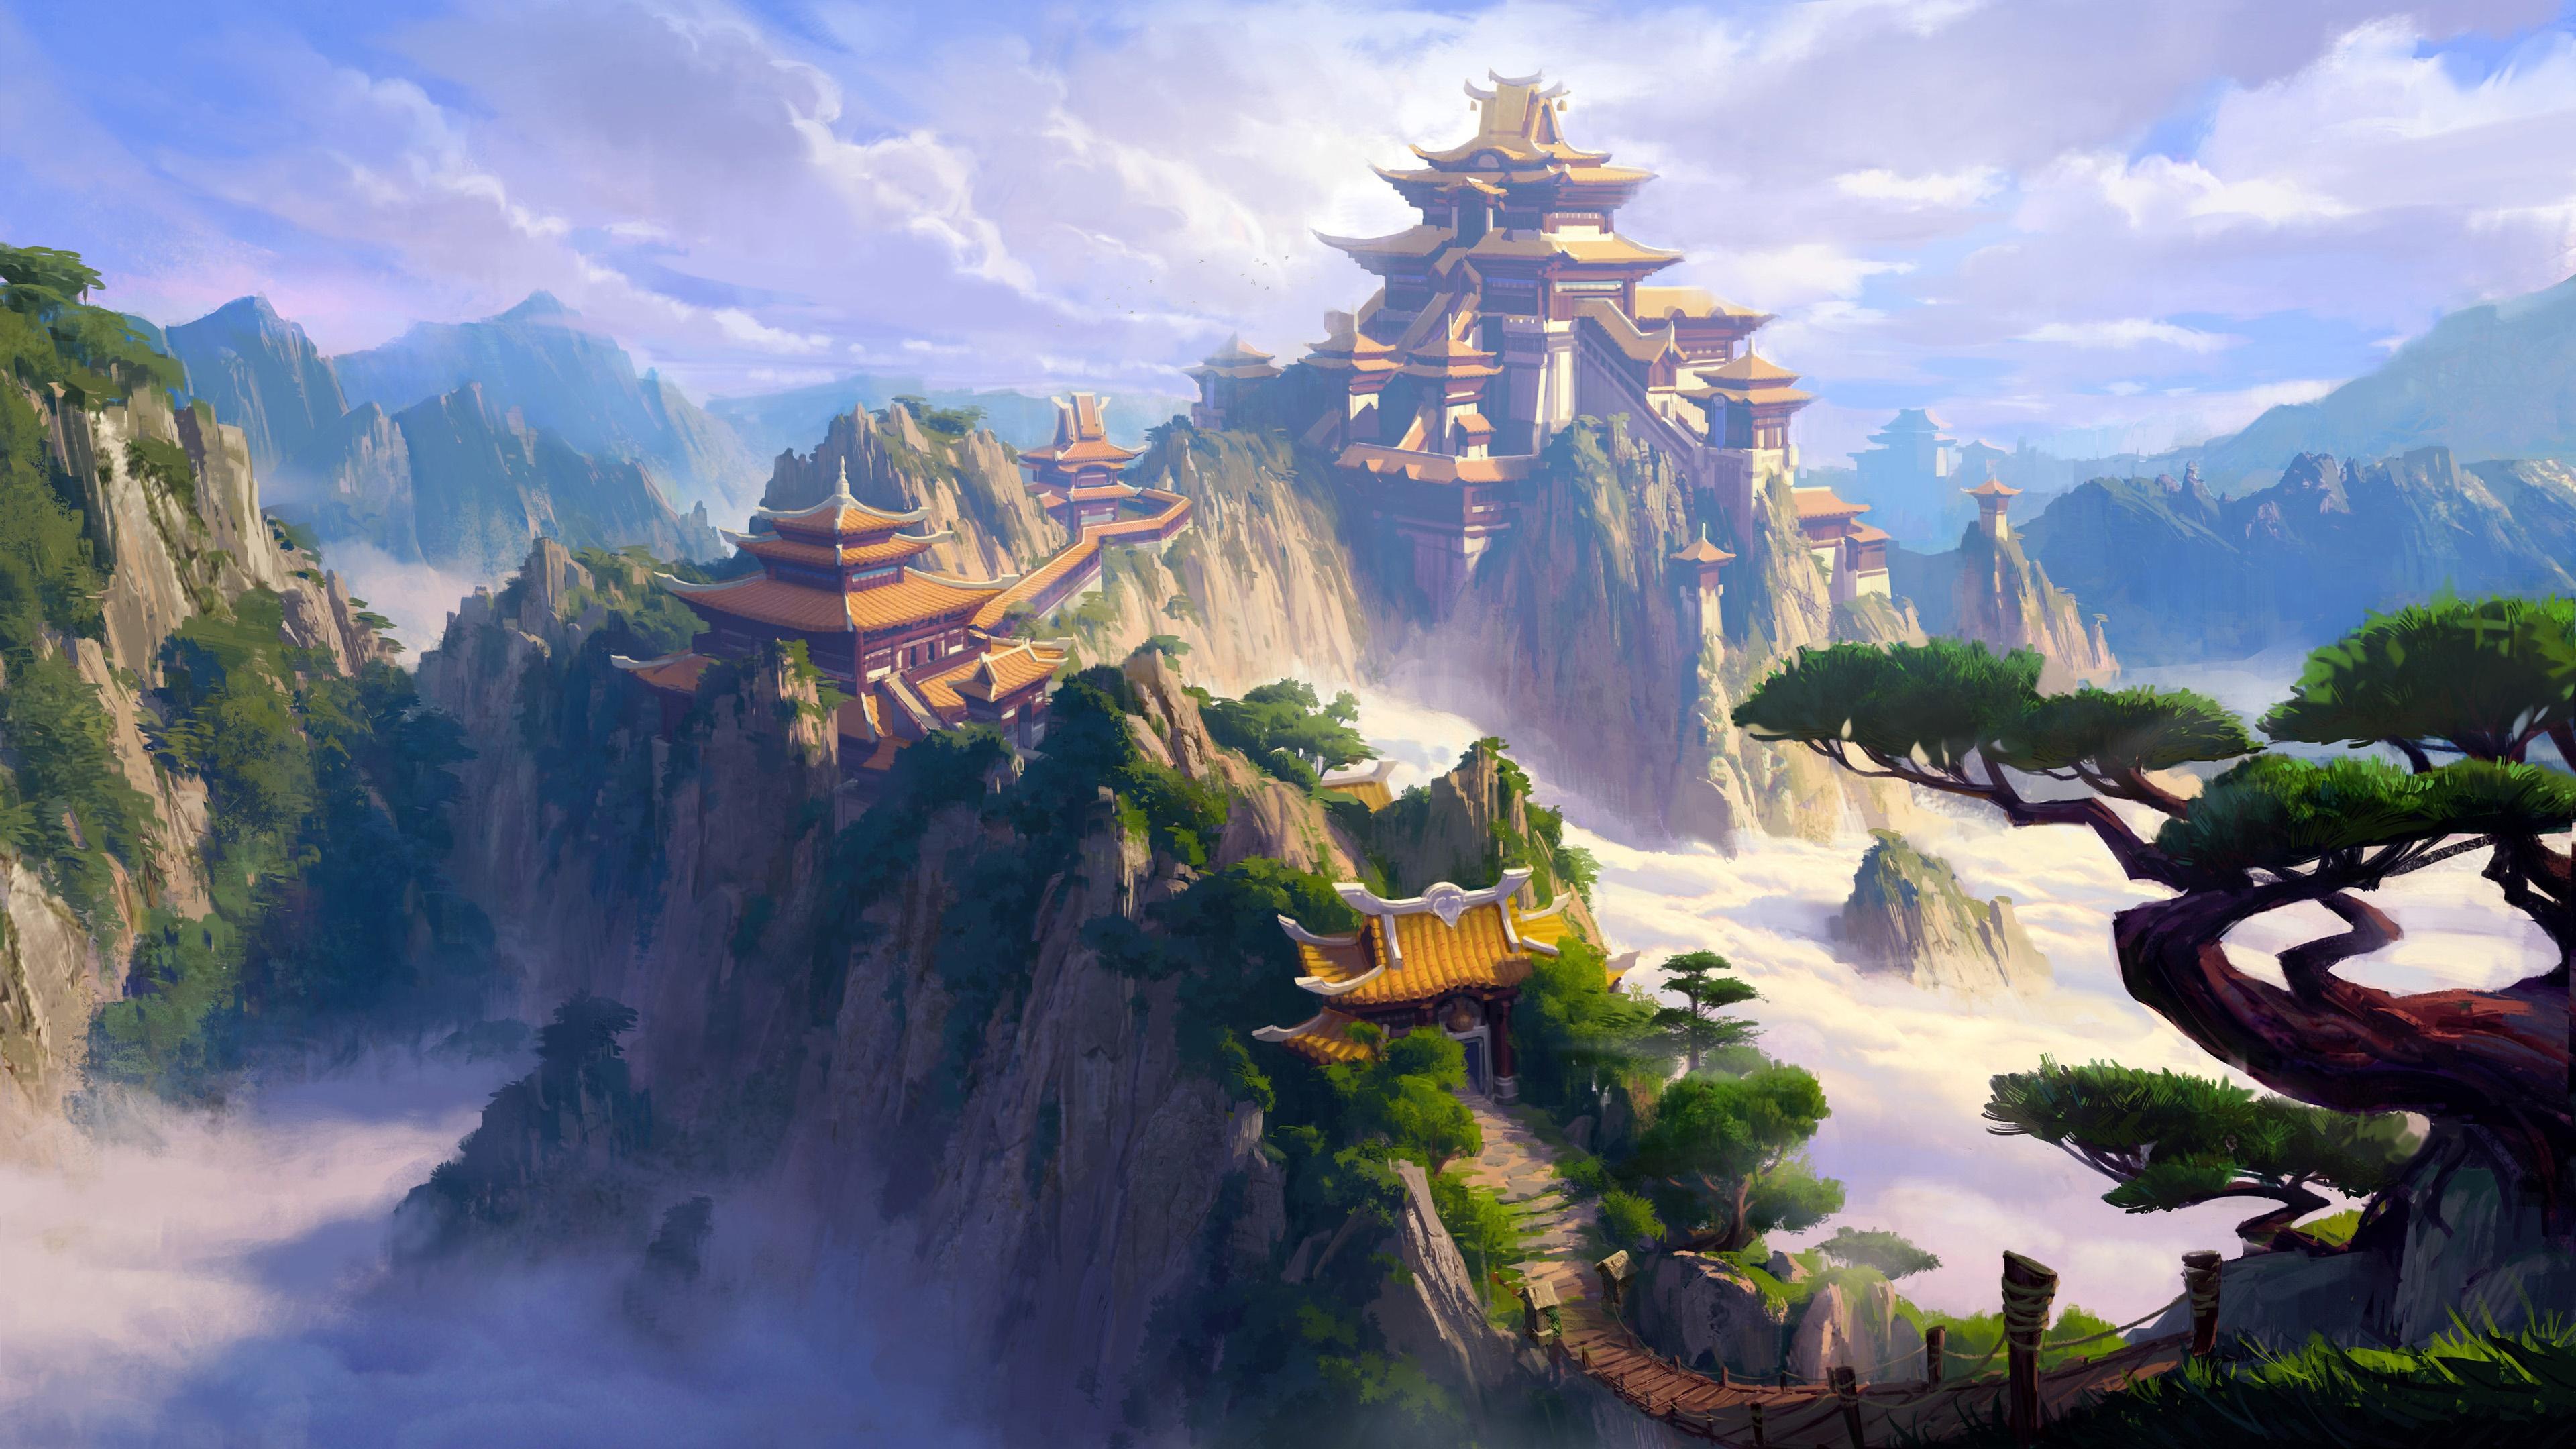 Landscape 4k Wallpaper